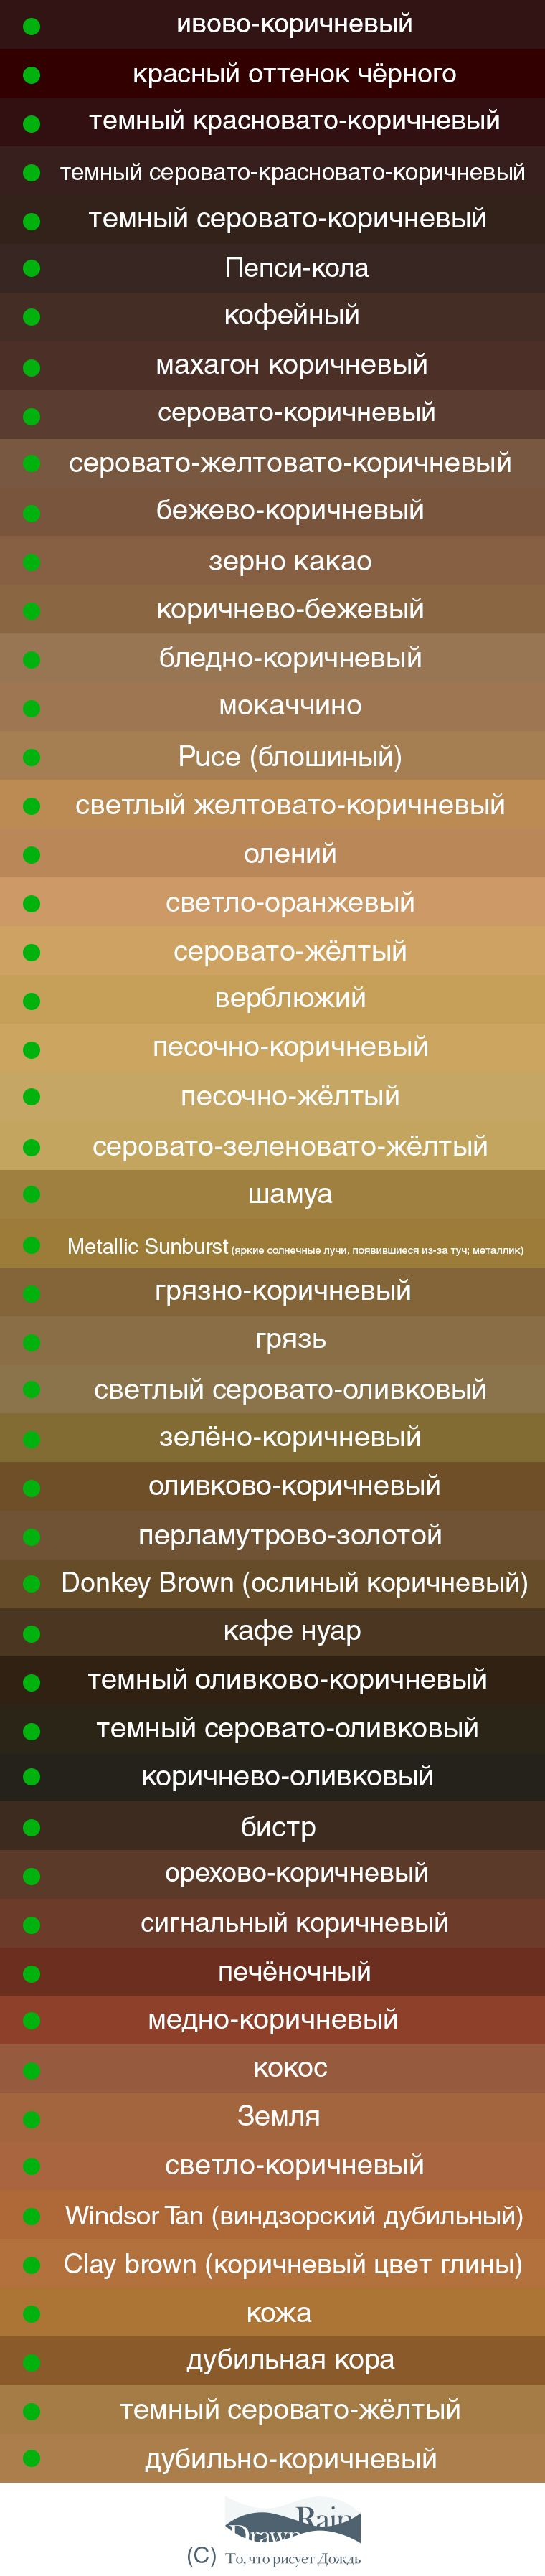 Оттенки коричневого цвета палитра фото и названия